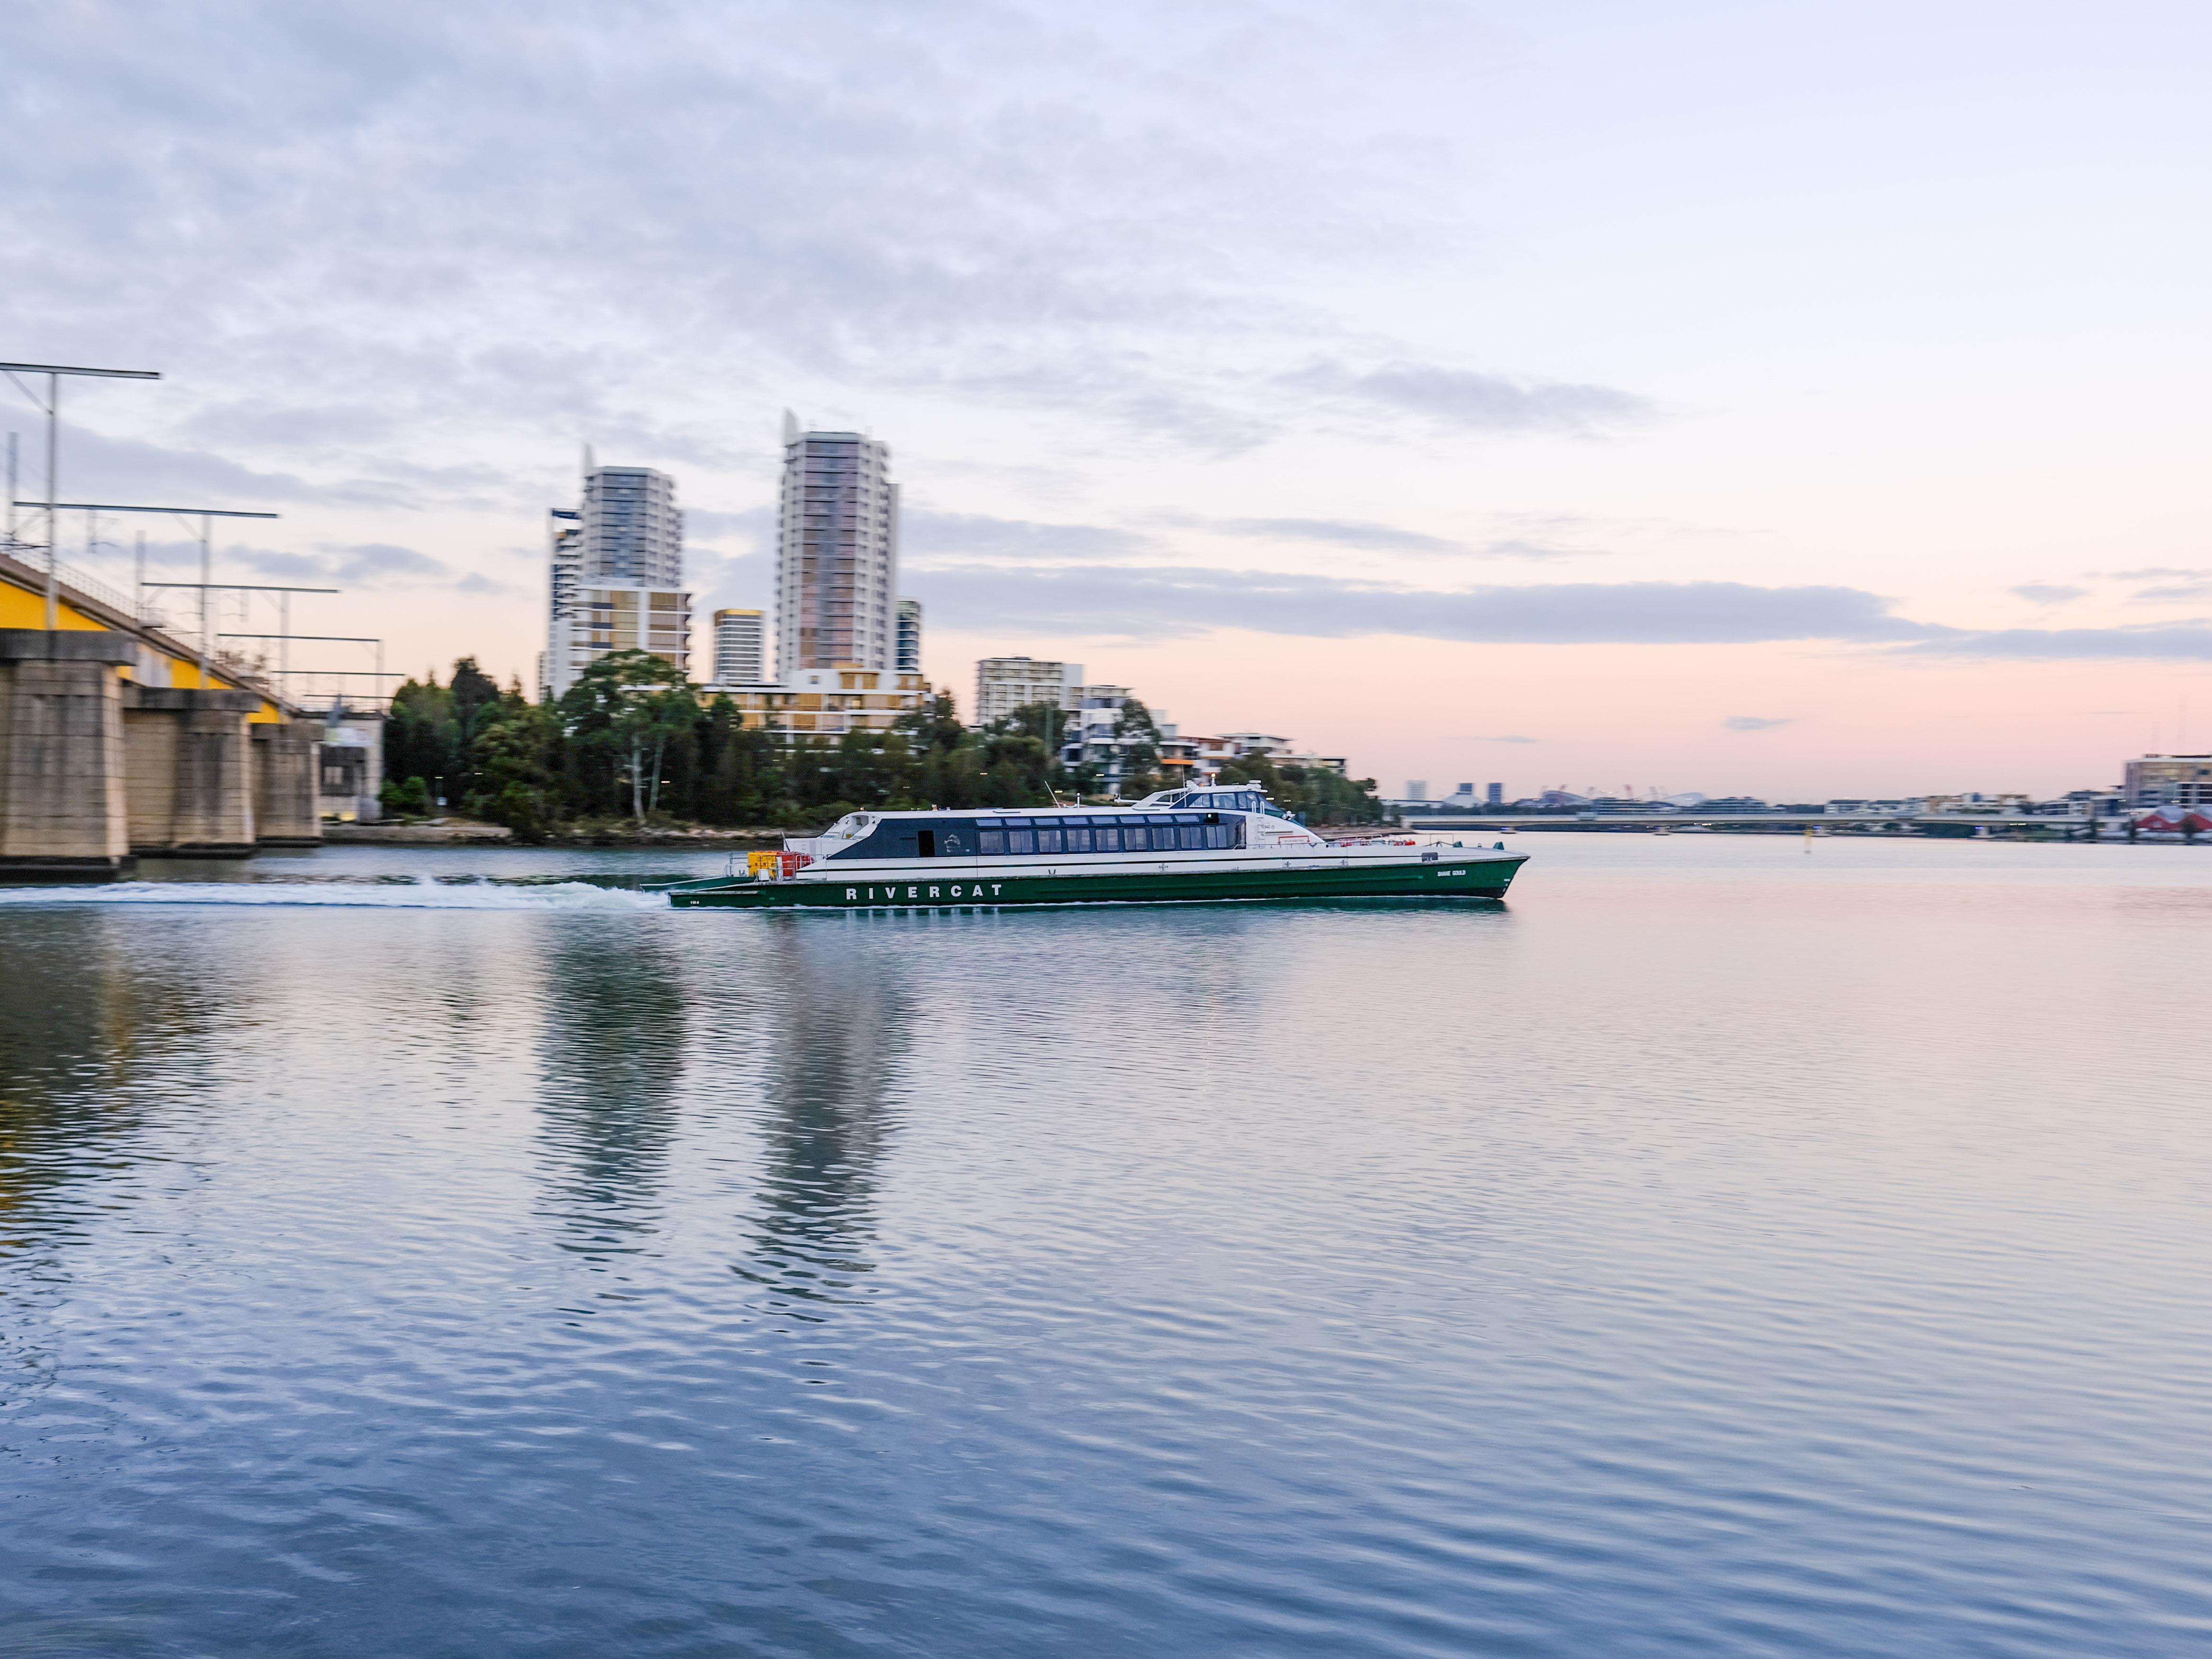 Fujifilm GFX50S II sample shot – Sydney river ferry